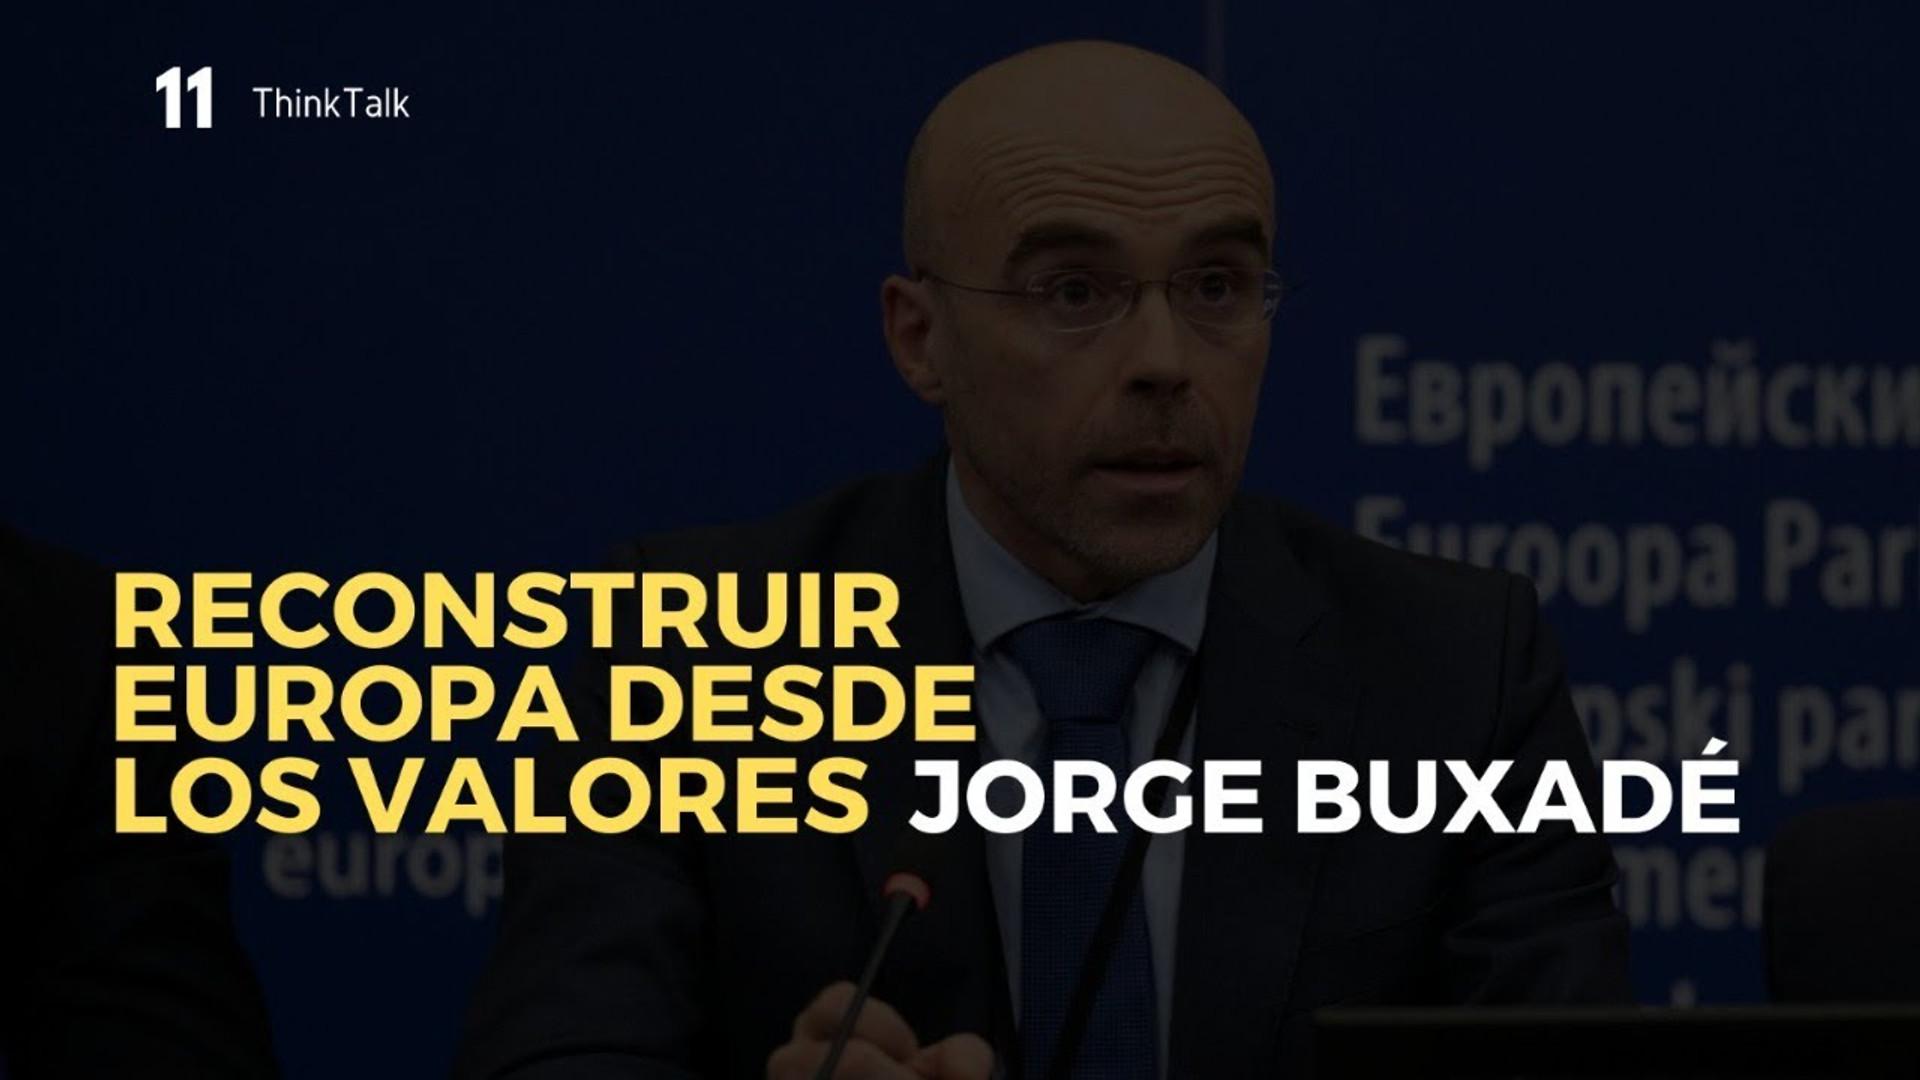 ThinkTalk11: Jorge Buxadé, Eurodiputado